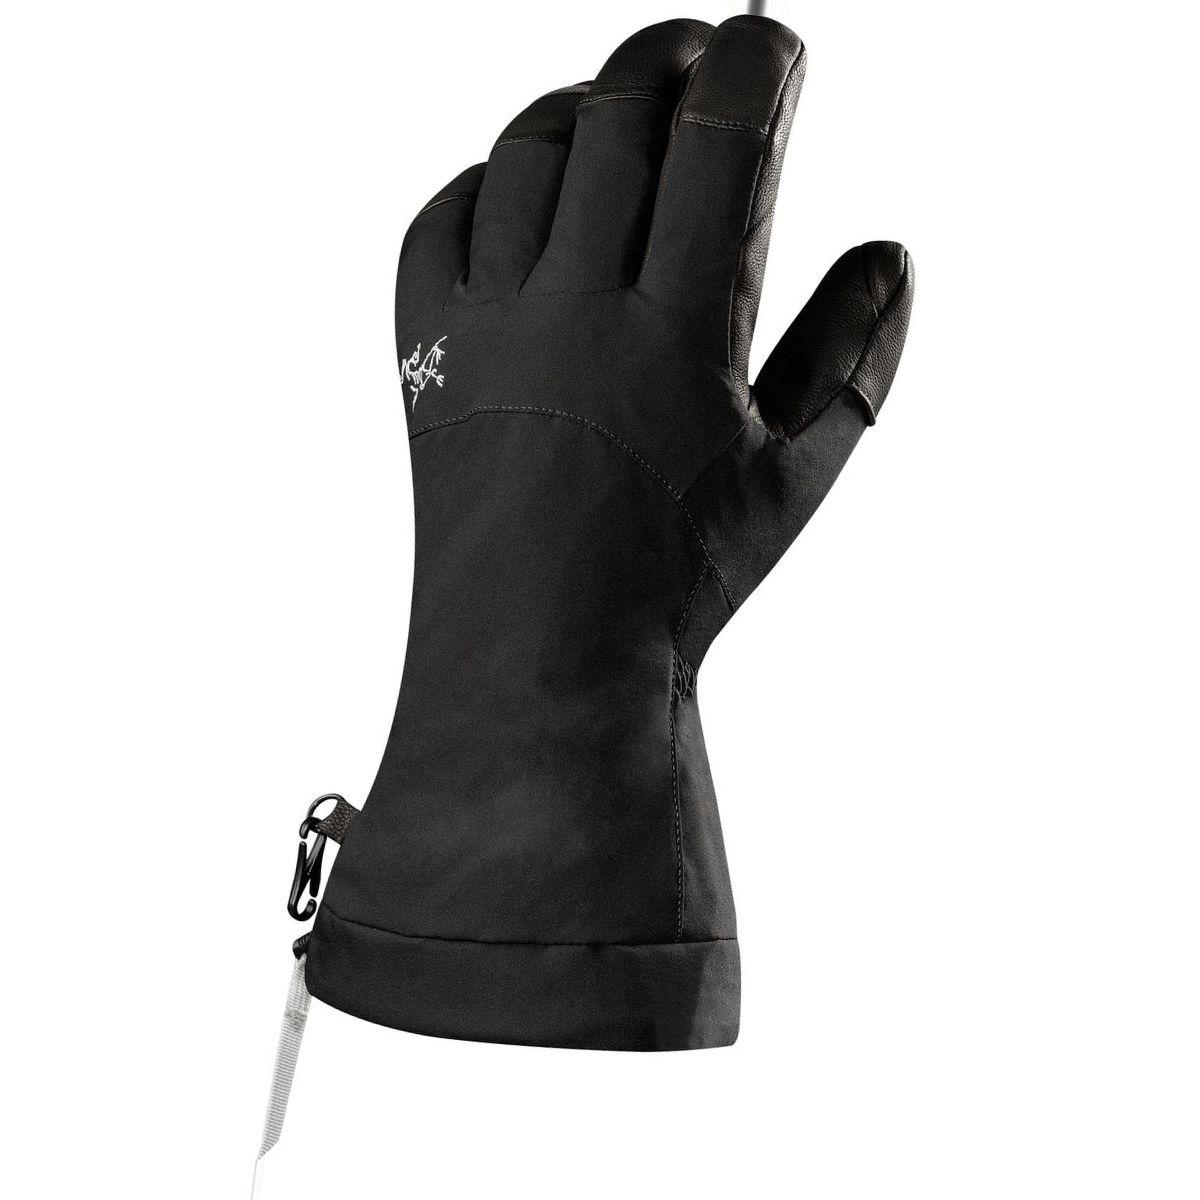 Arc'teryx Fission Gore-Tex Glove - Men's